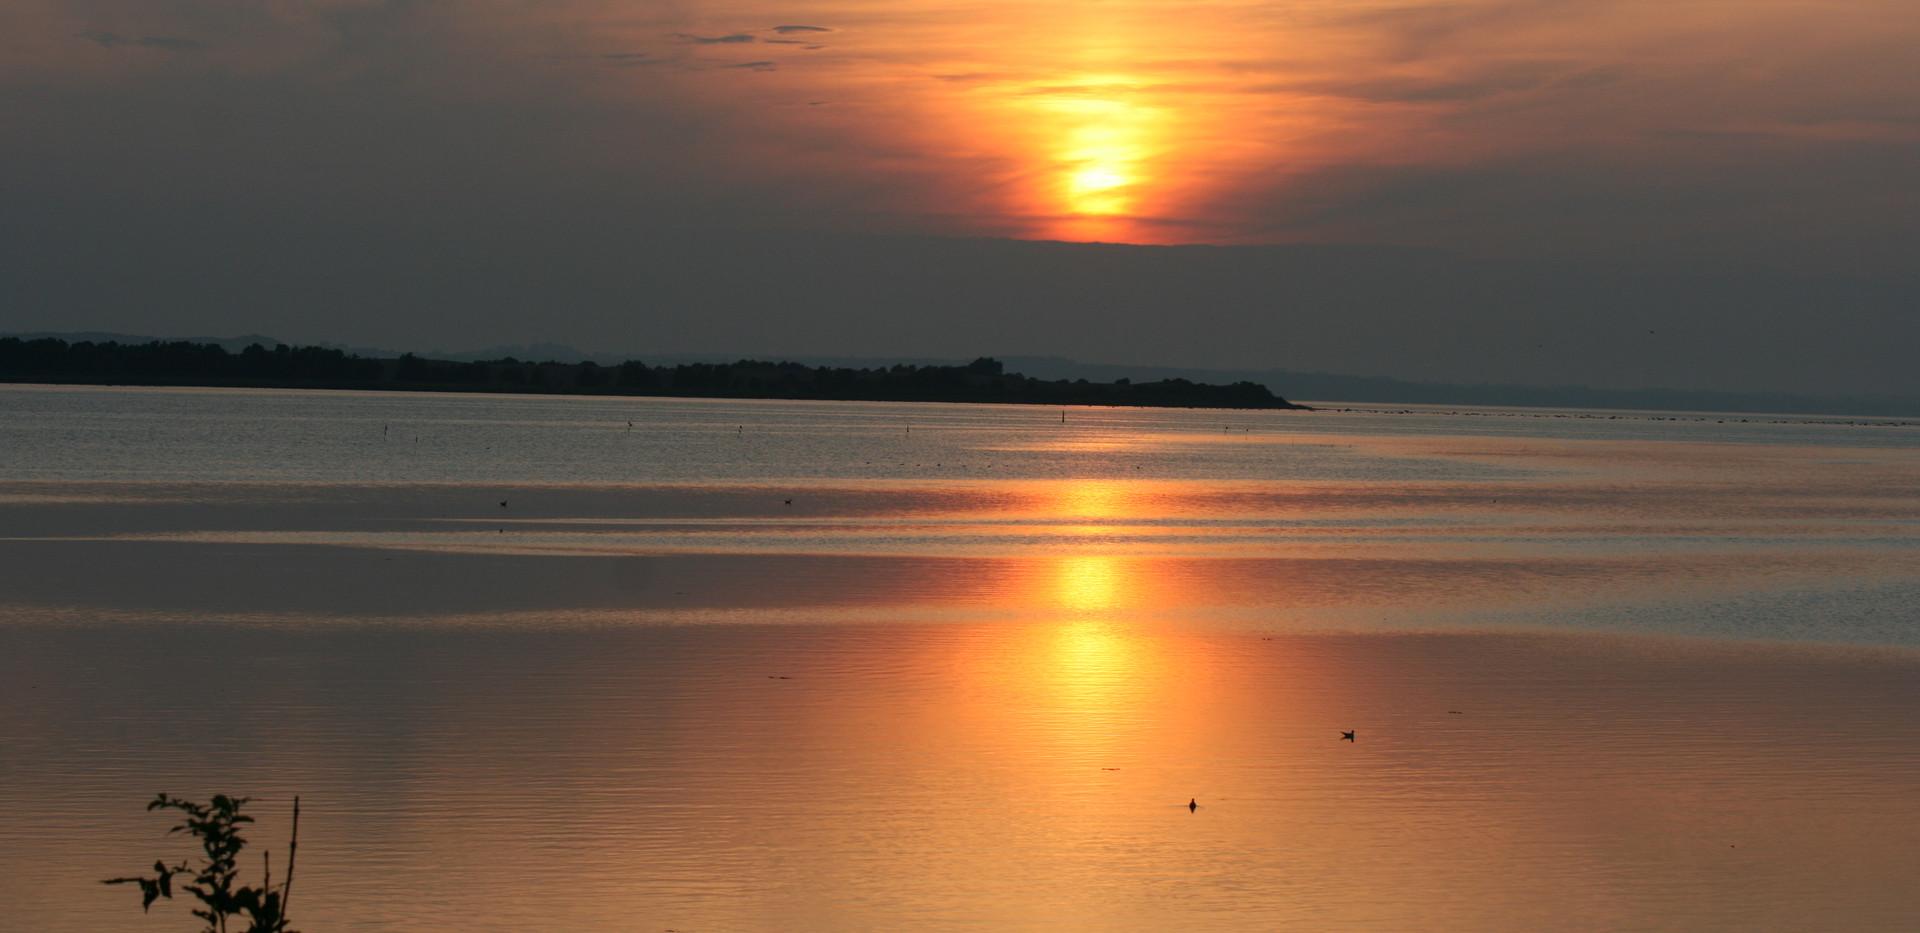 Sømer_sunset.JPG